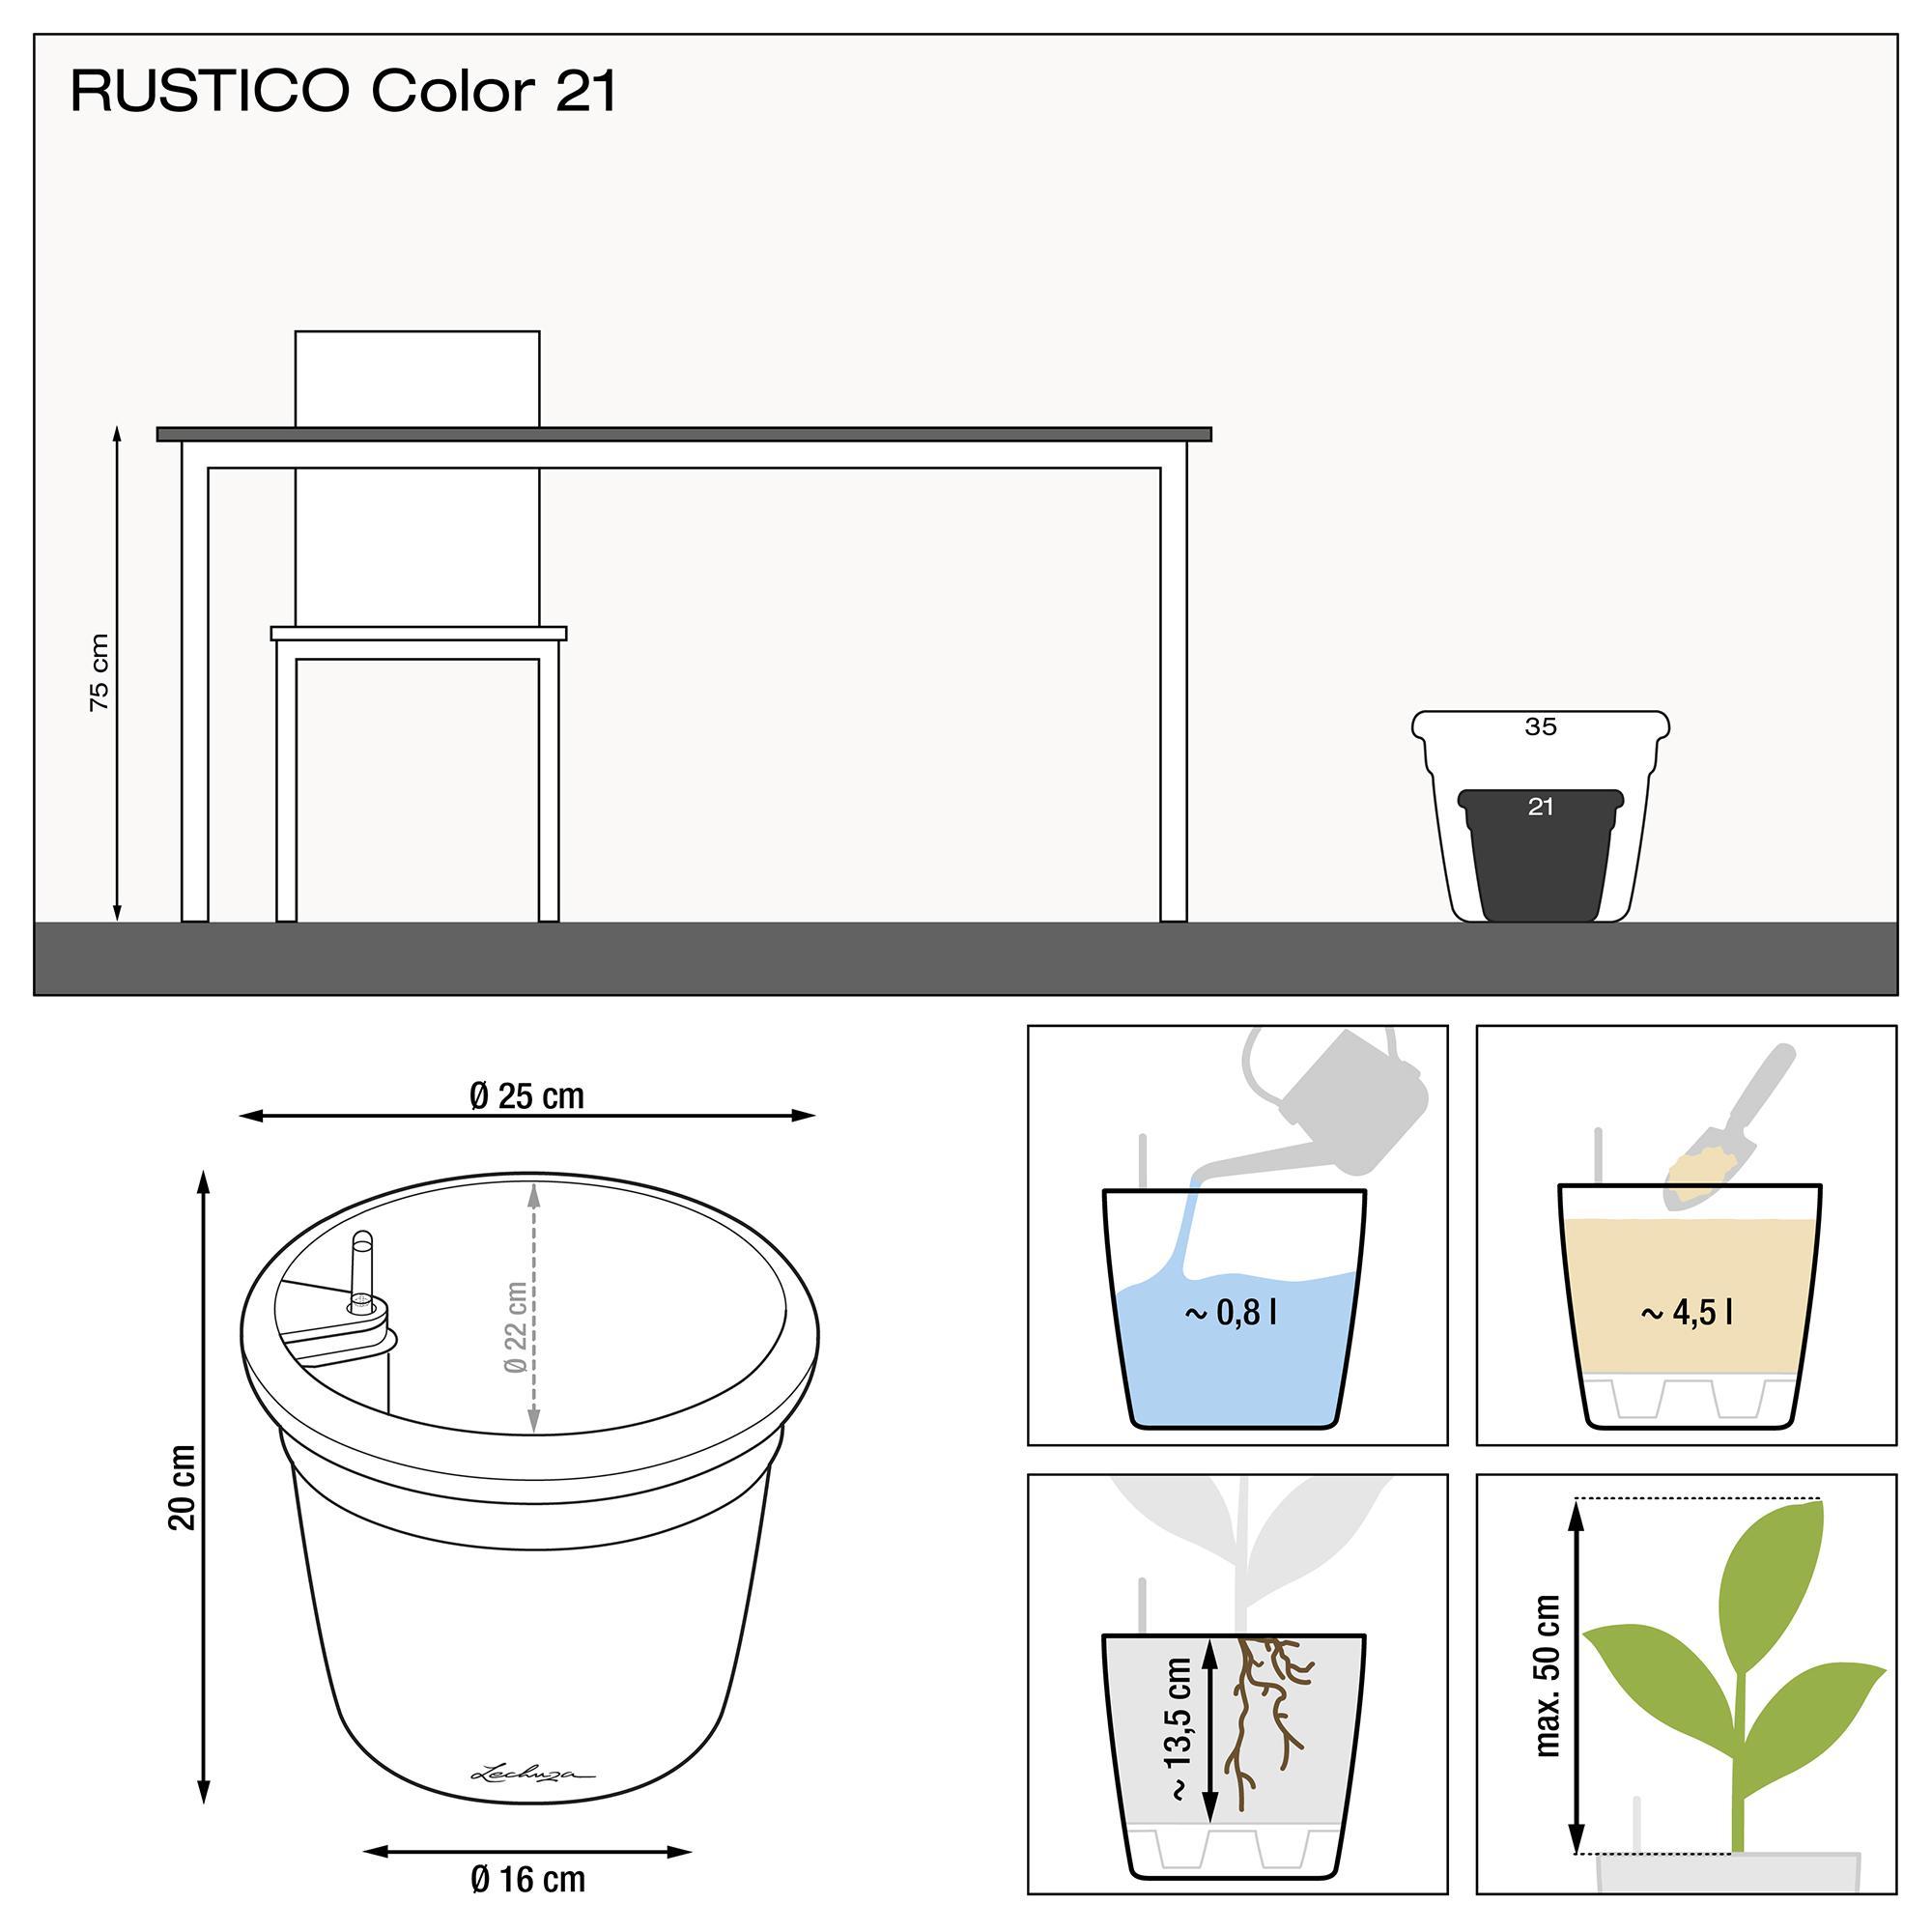 RUSTICO Color 21 sand beige - Image 2